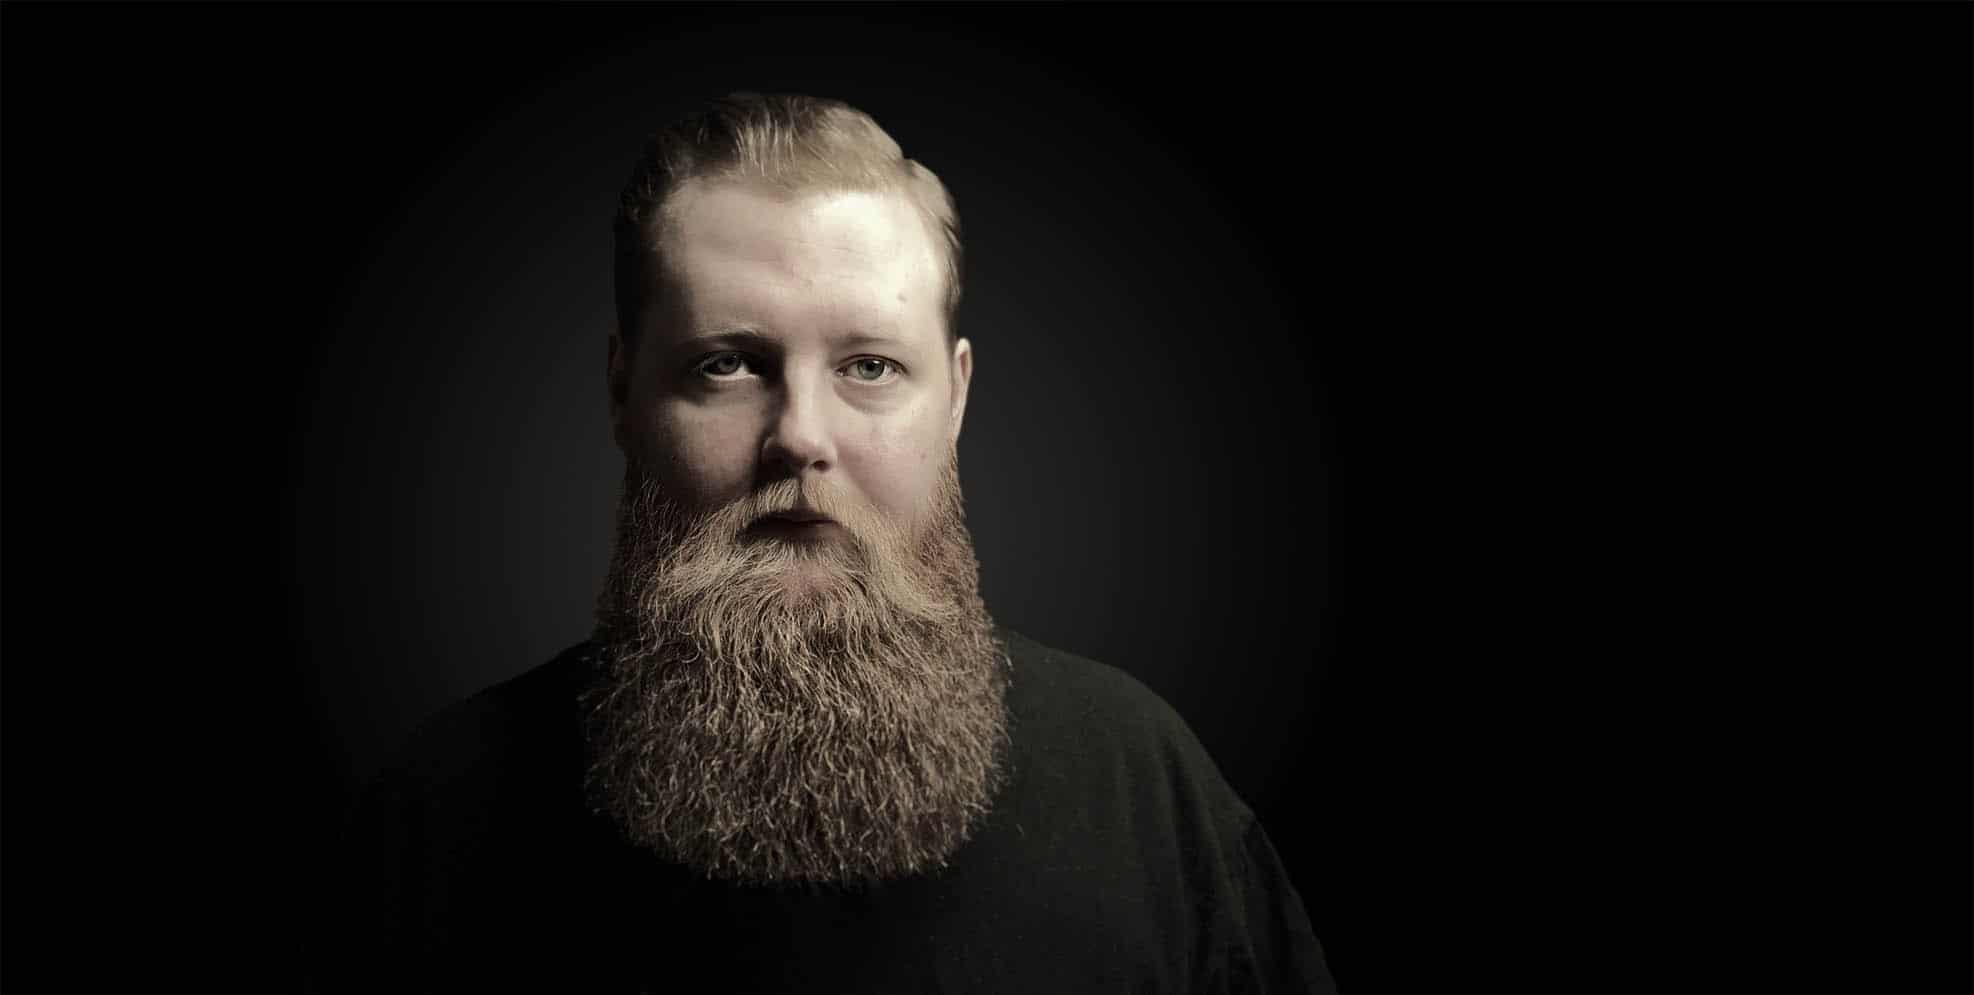 Hombre con barba - Barbería Bearbero